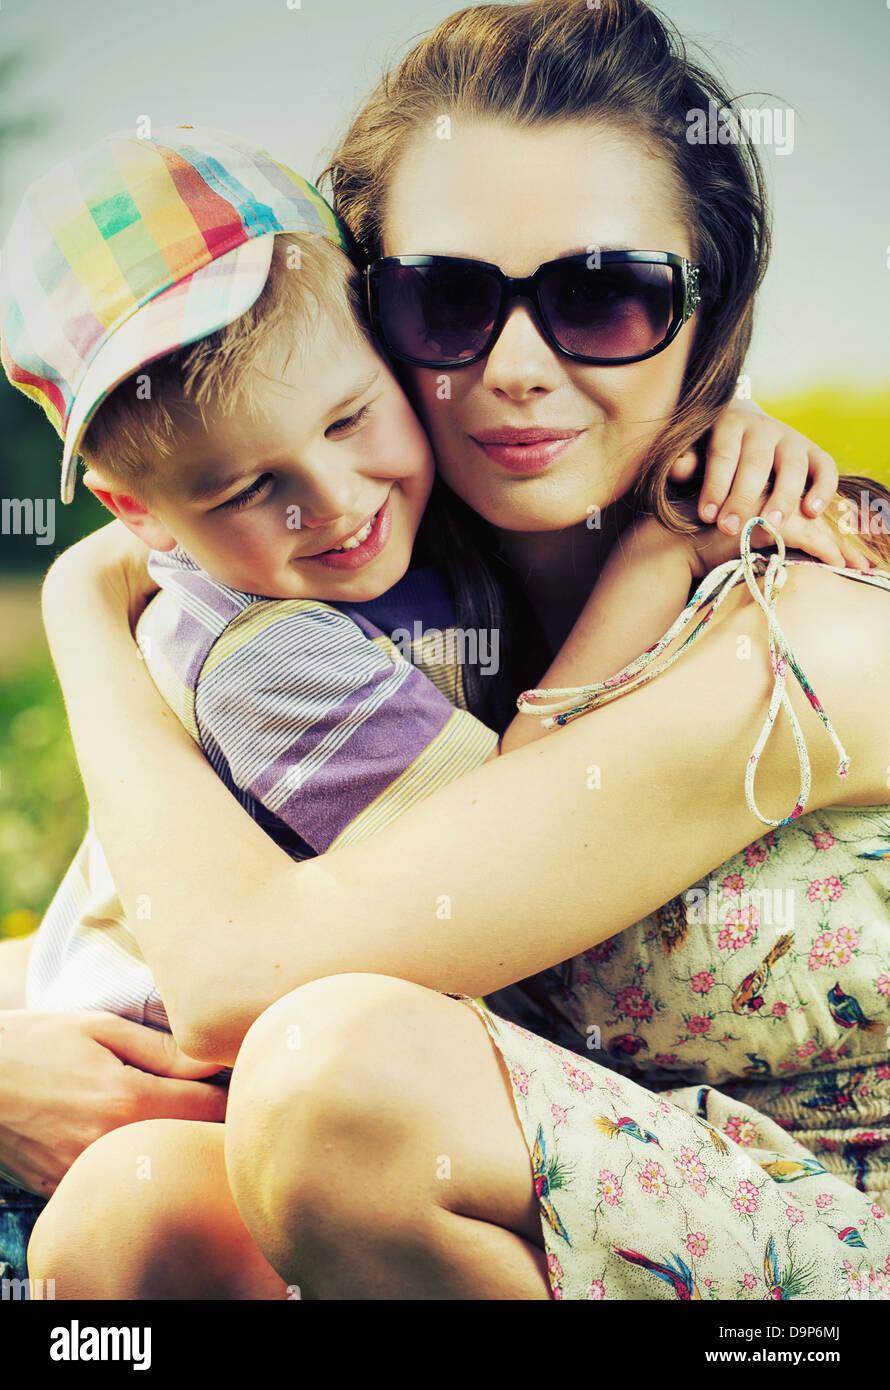 Hermosa mamá abrazando a su pequeño hijo lindo Imagen De Stock